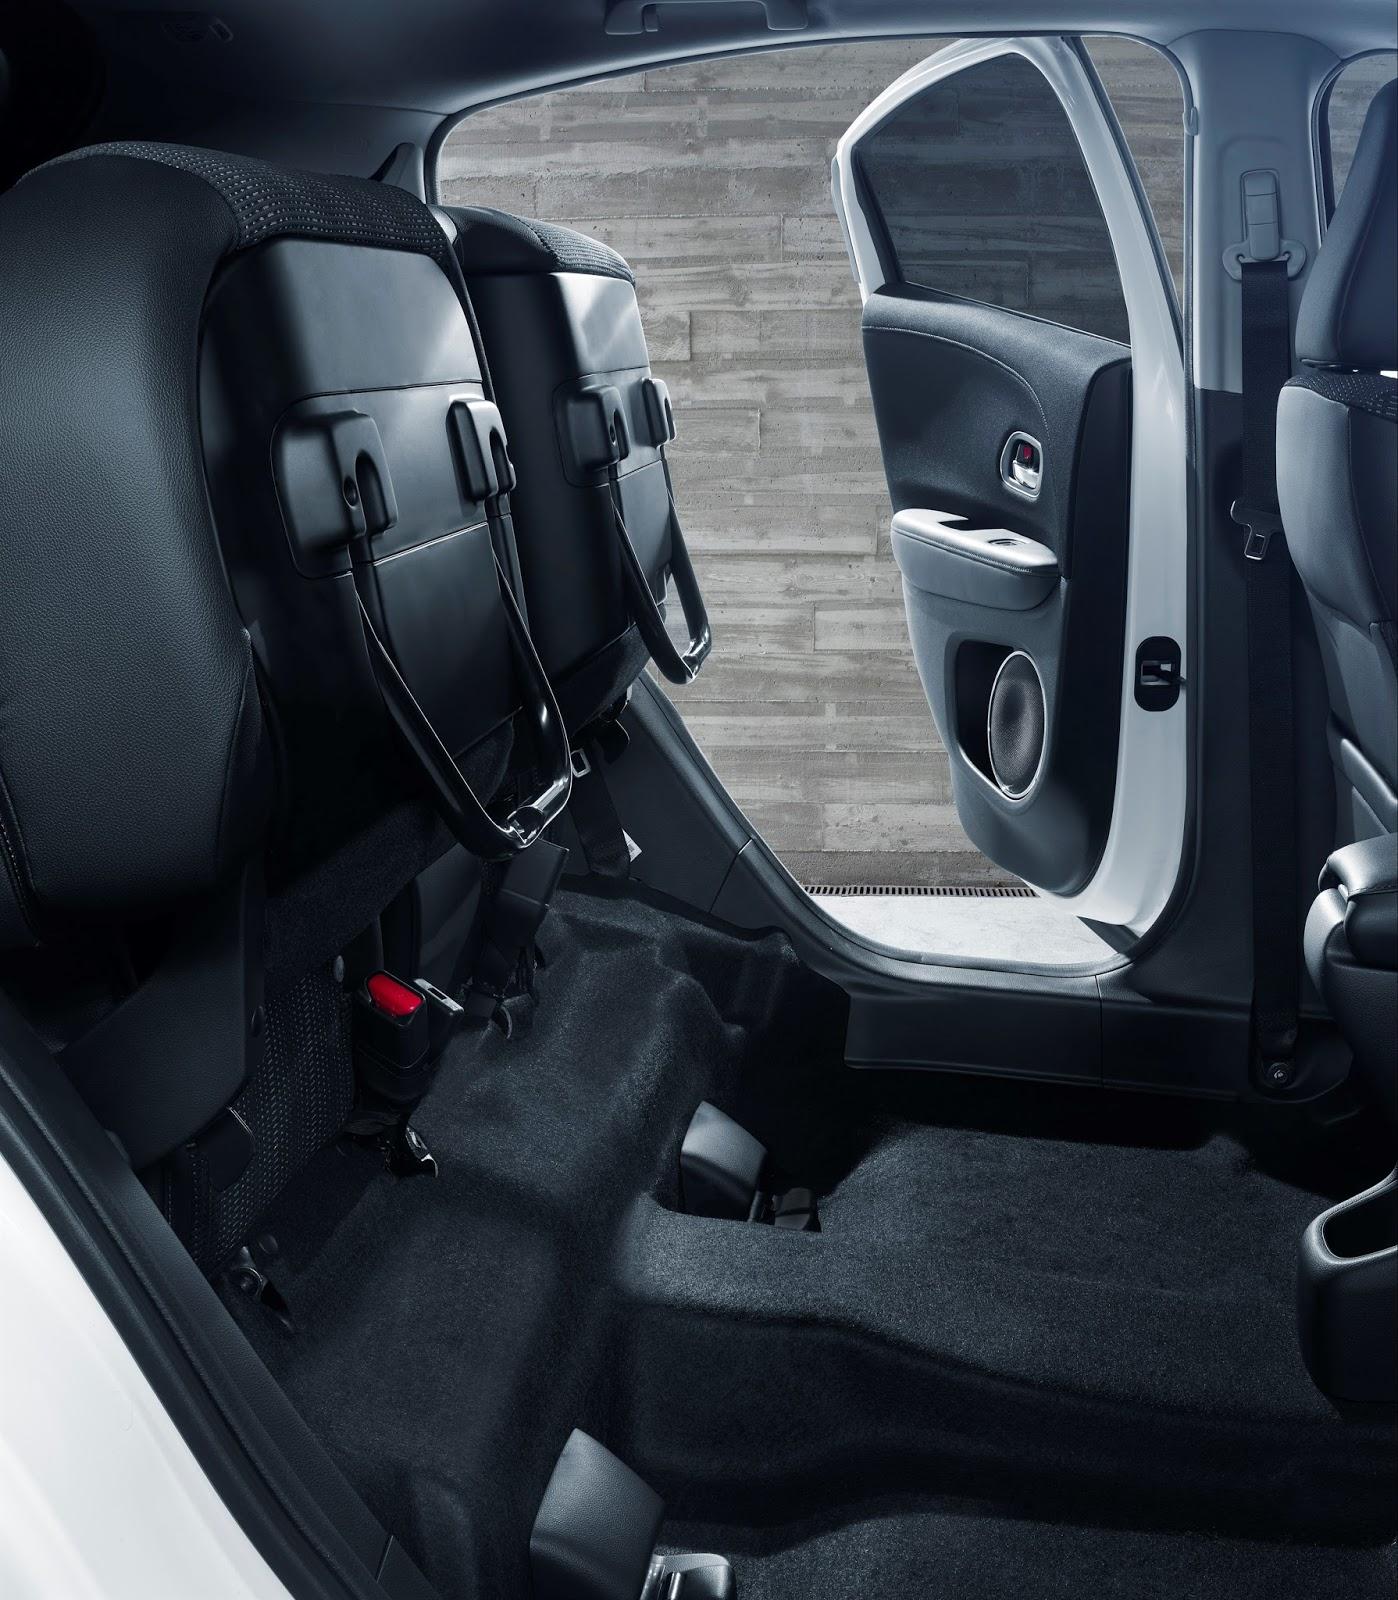 40677 2015 Honda HR V Νέο Honda HR-V : Το πολυμορφικό SUV